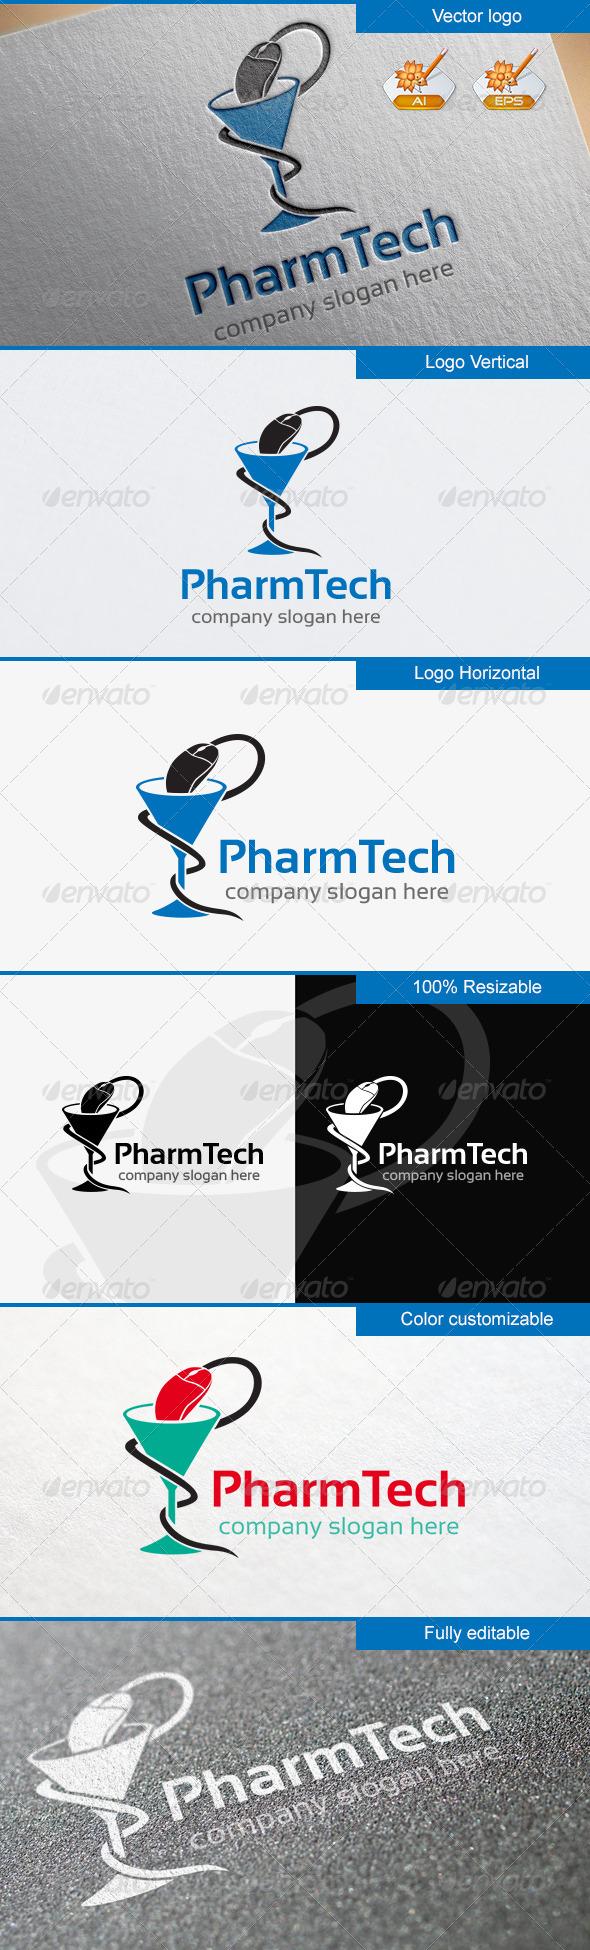 GraphicRiver pharmTech 8158755